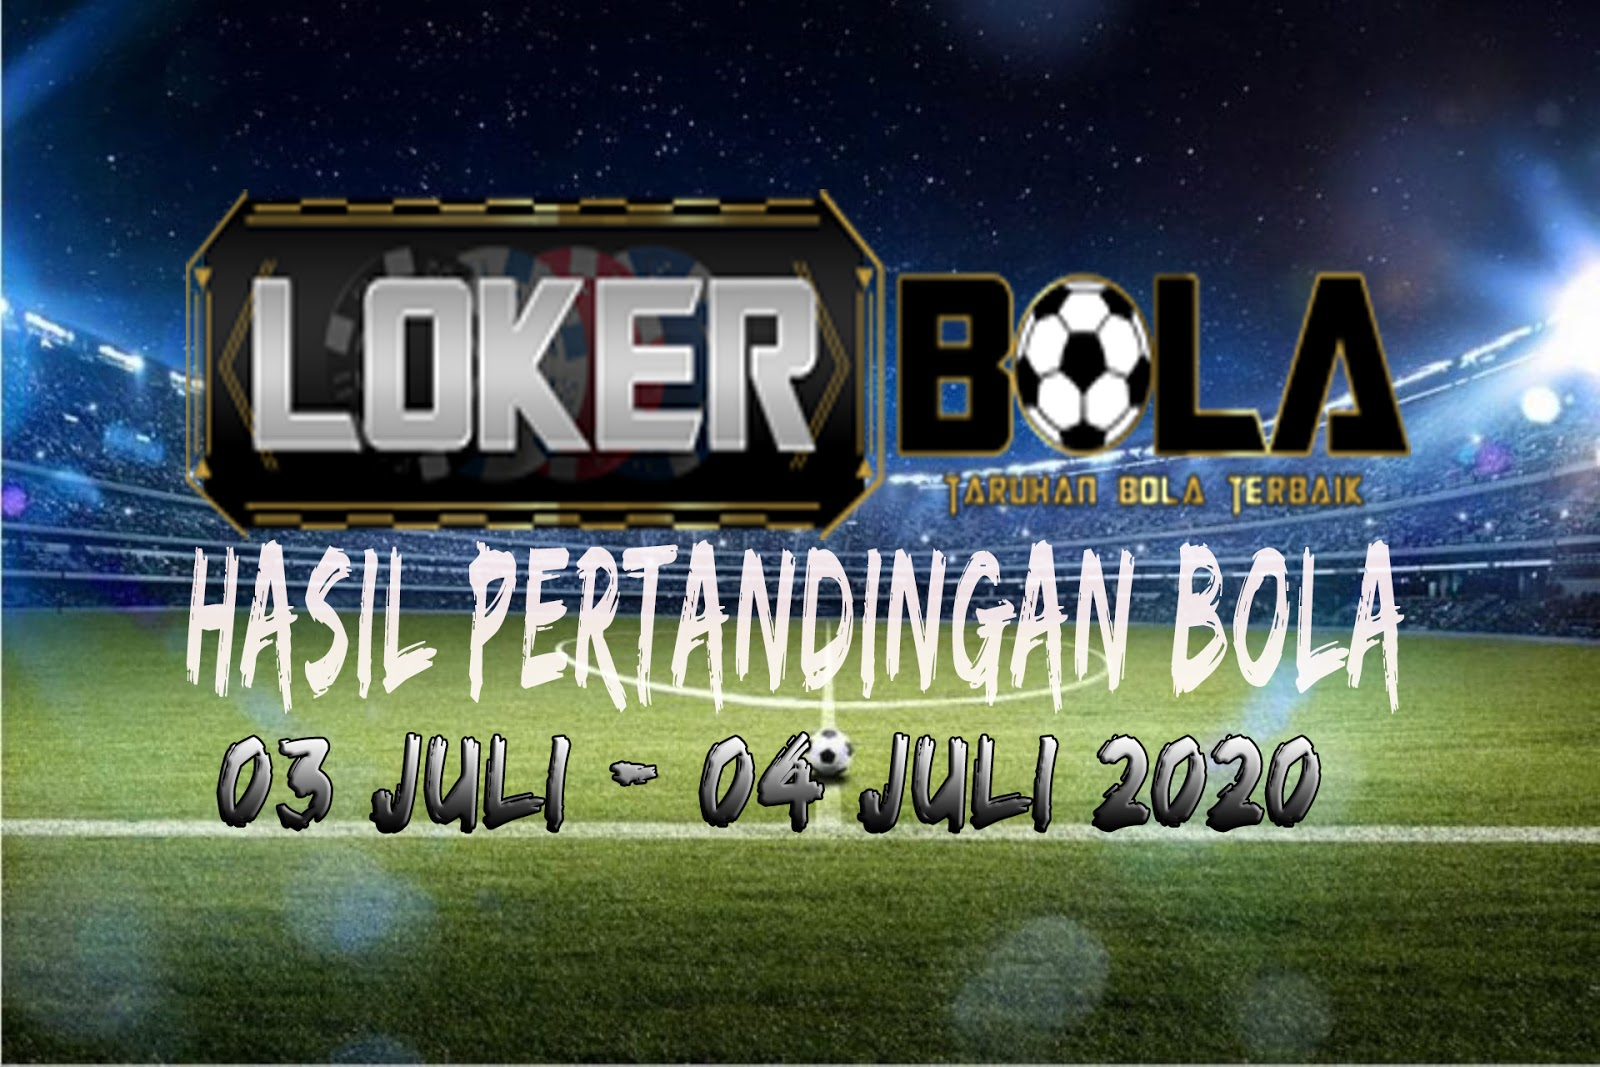 HASIL PERTANDINGAN BOLA 03-04 JULI 2020